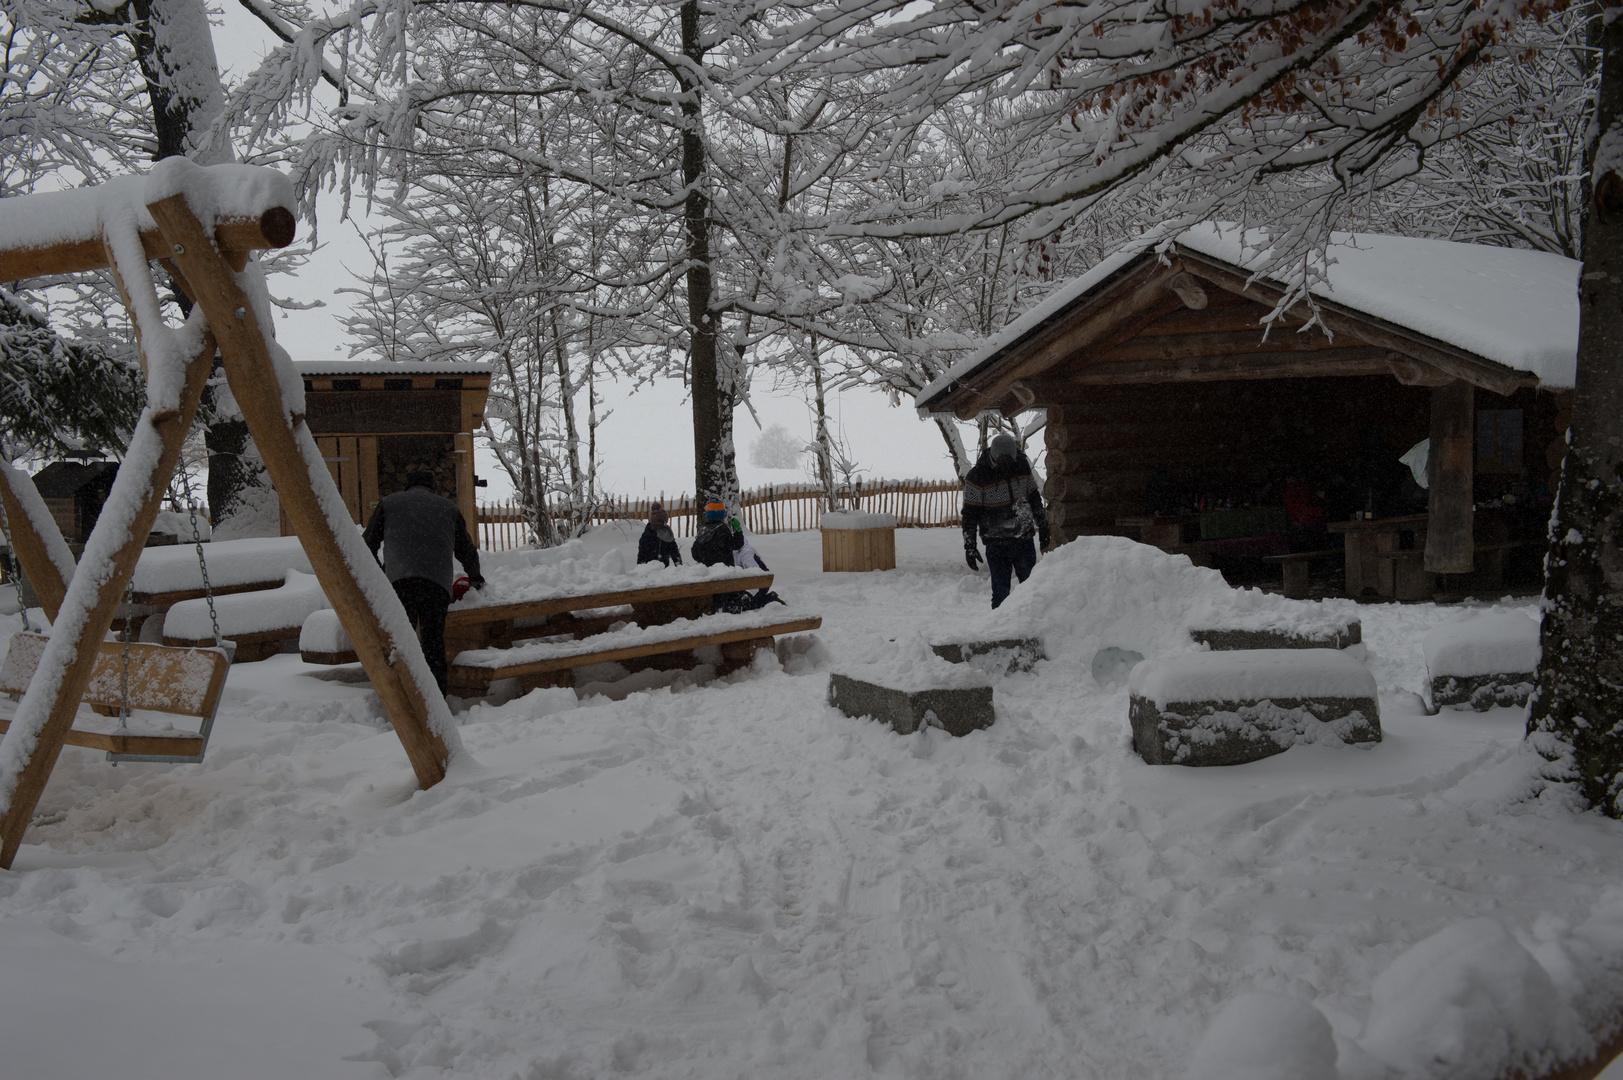 Grillplatz Thanwald 3. Feb. 2019